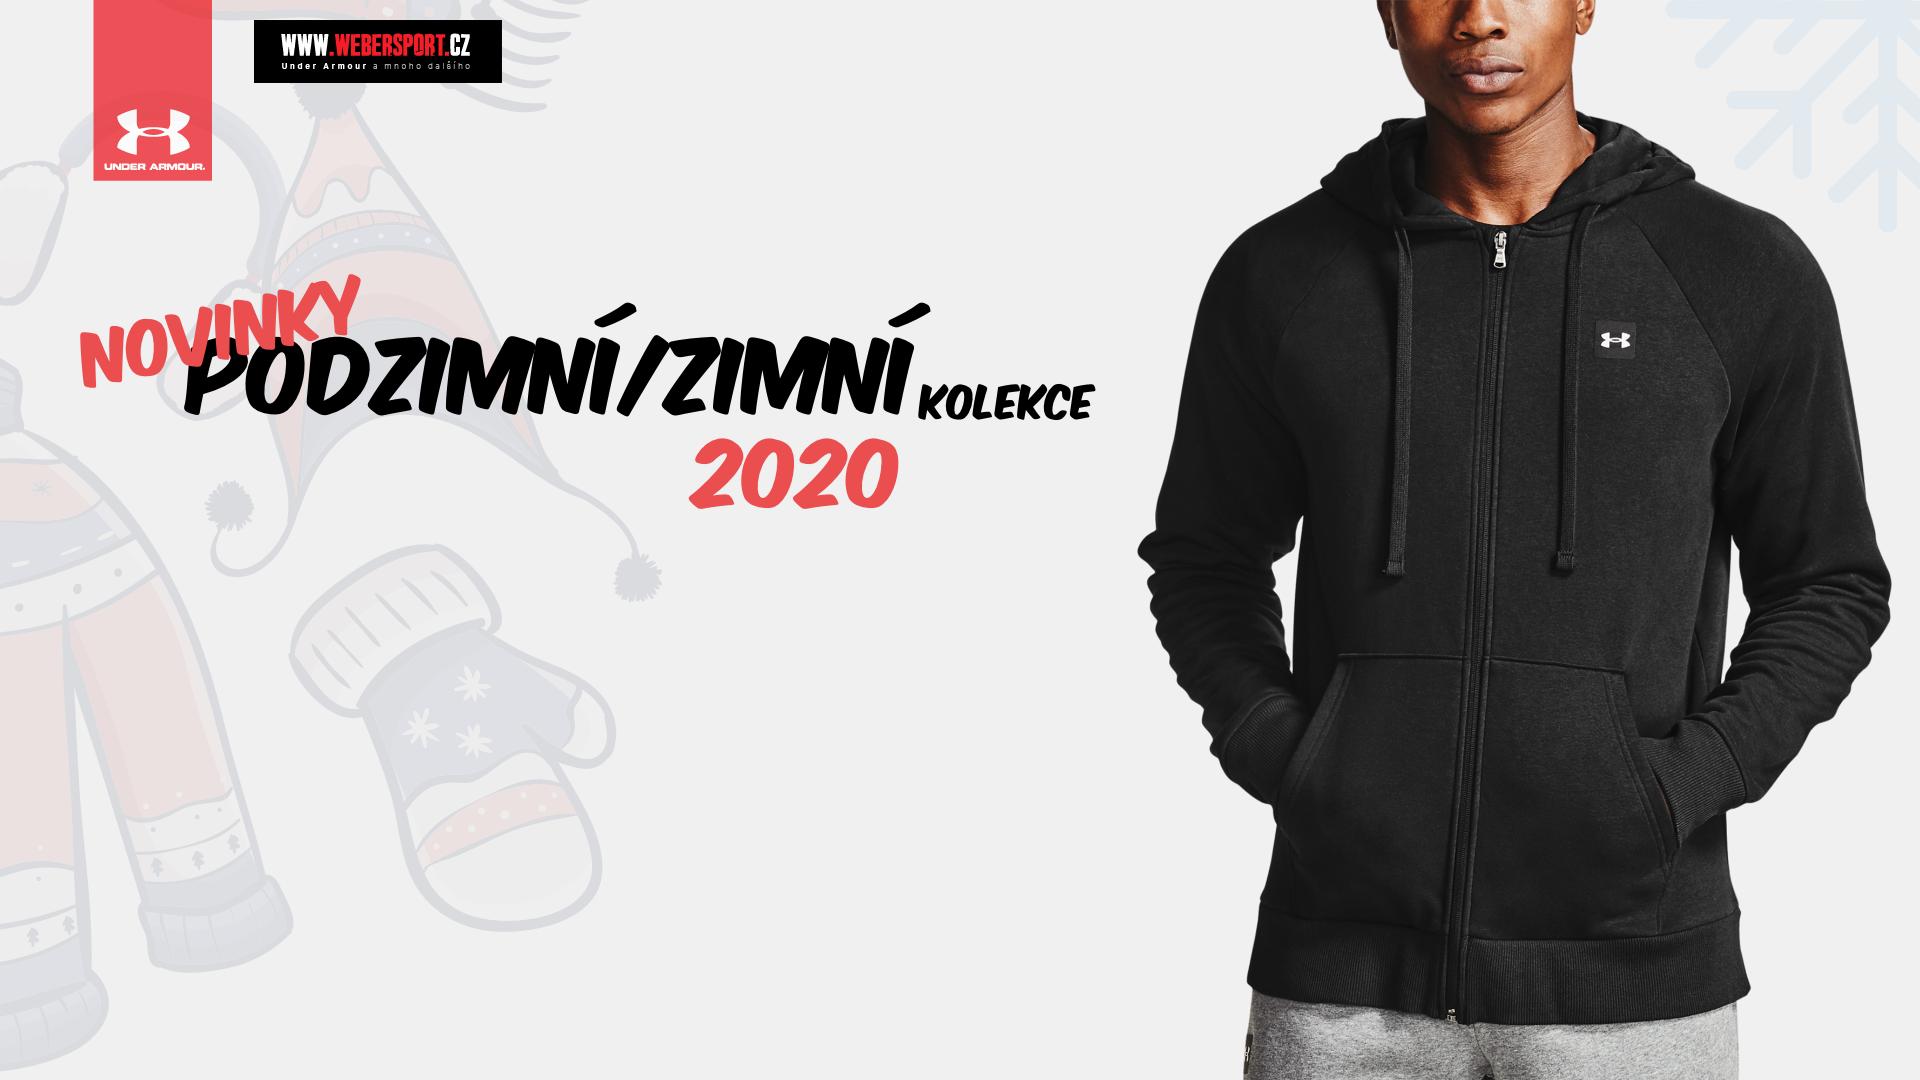 Podzim/zima 2020